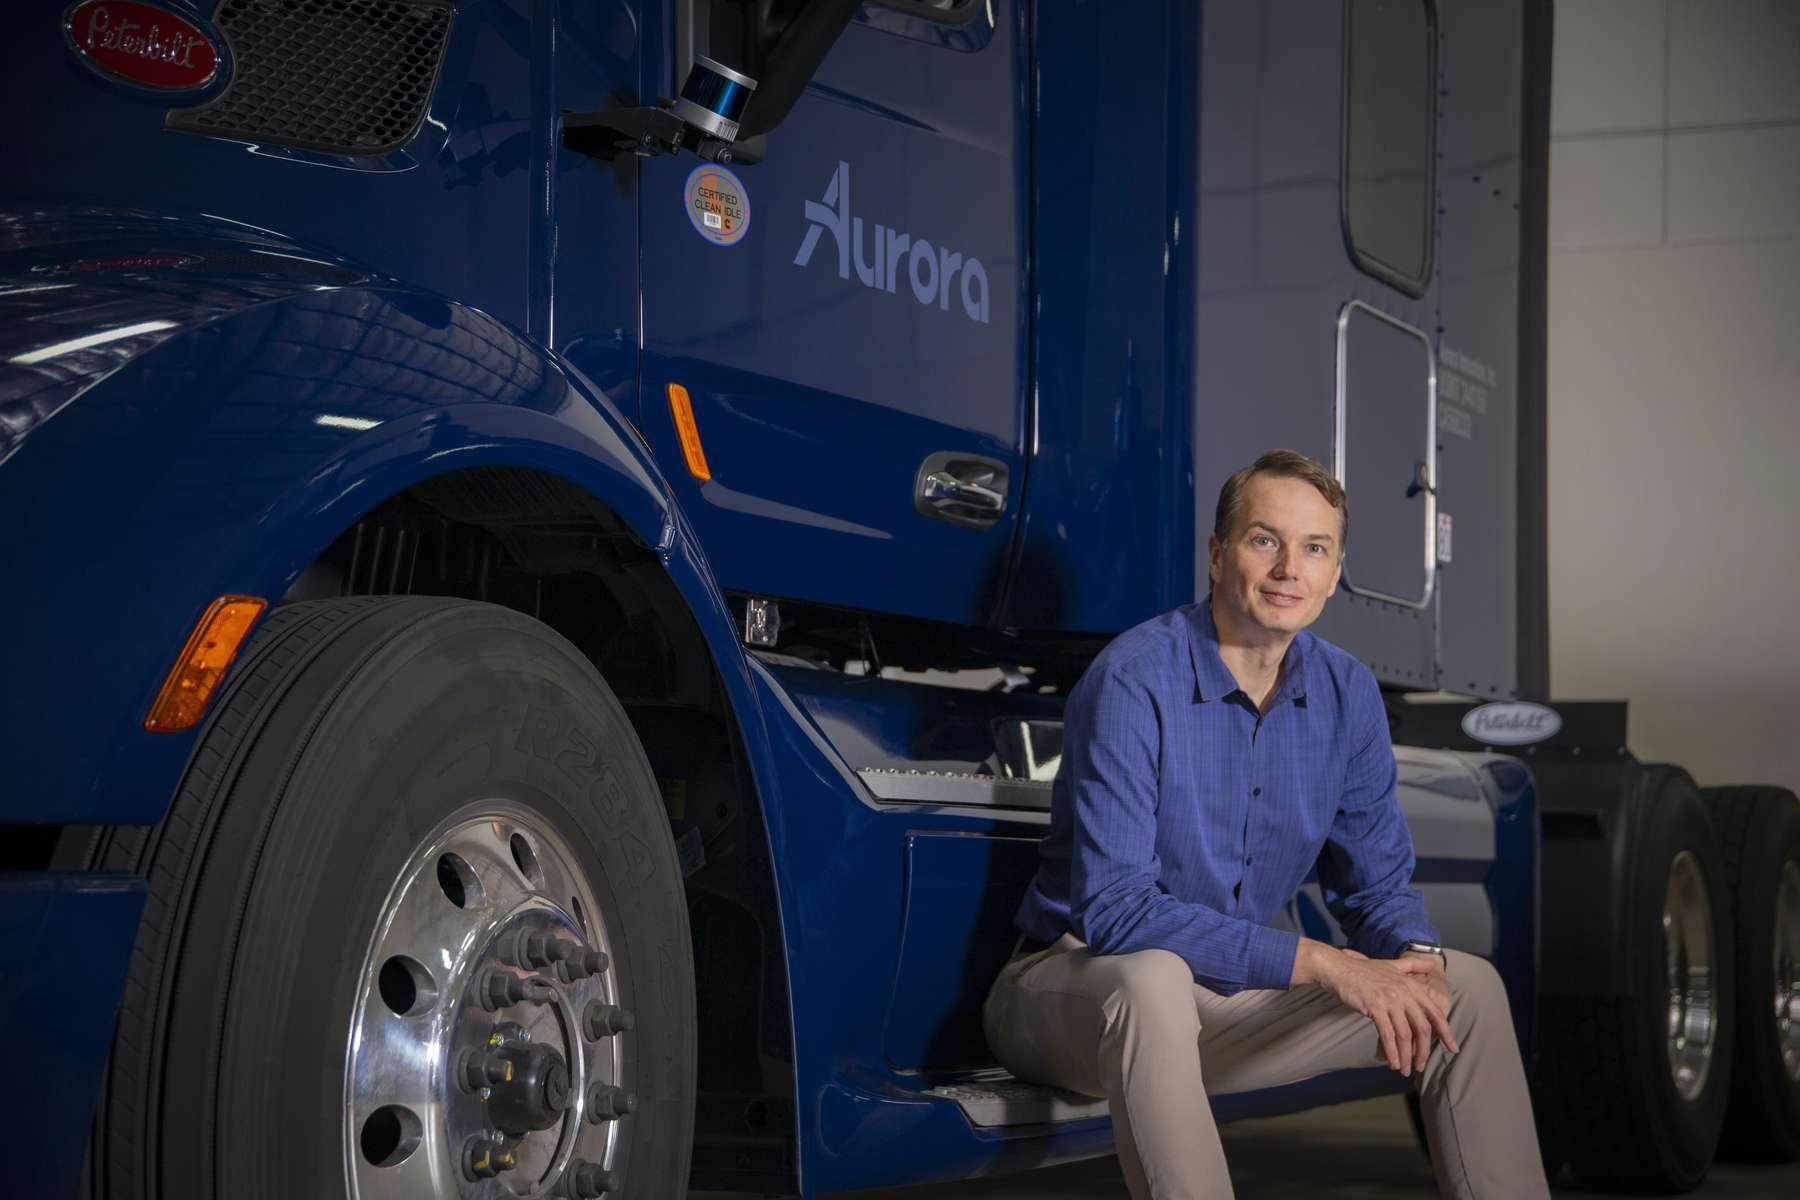 Aurora - Chris Urmson - Tractor.jpeg